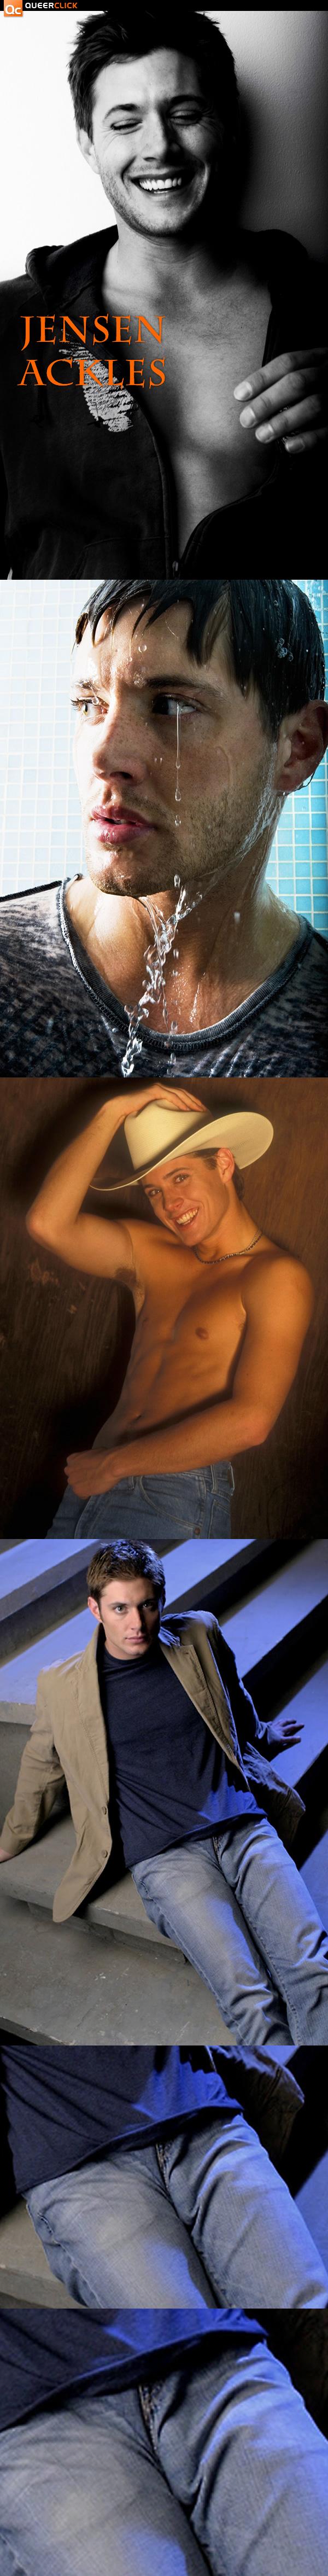 Jensen Ackles Bulge